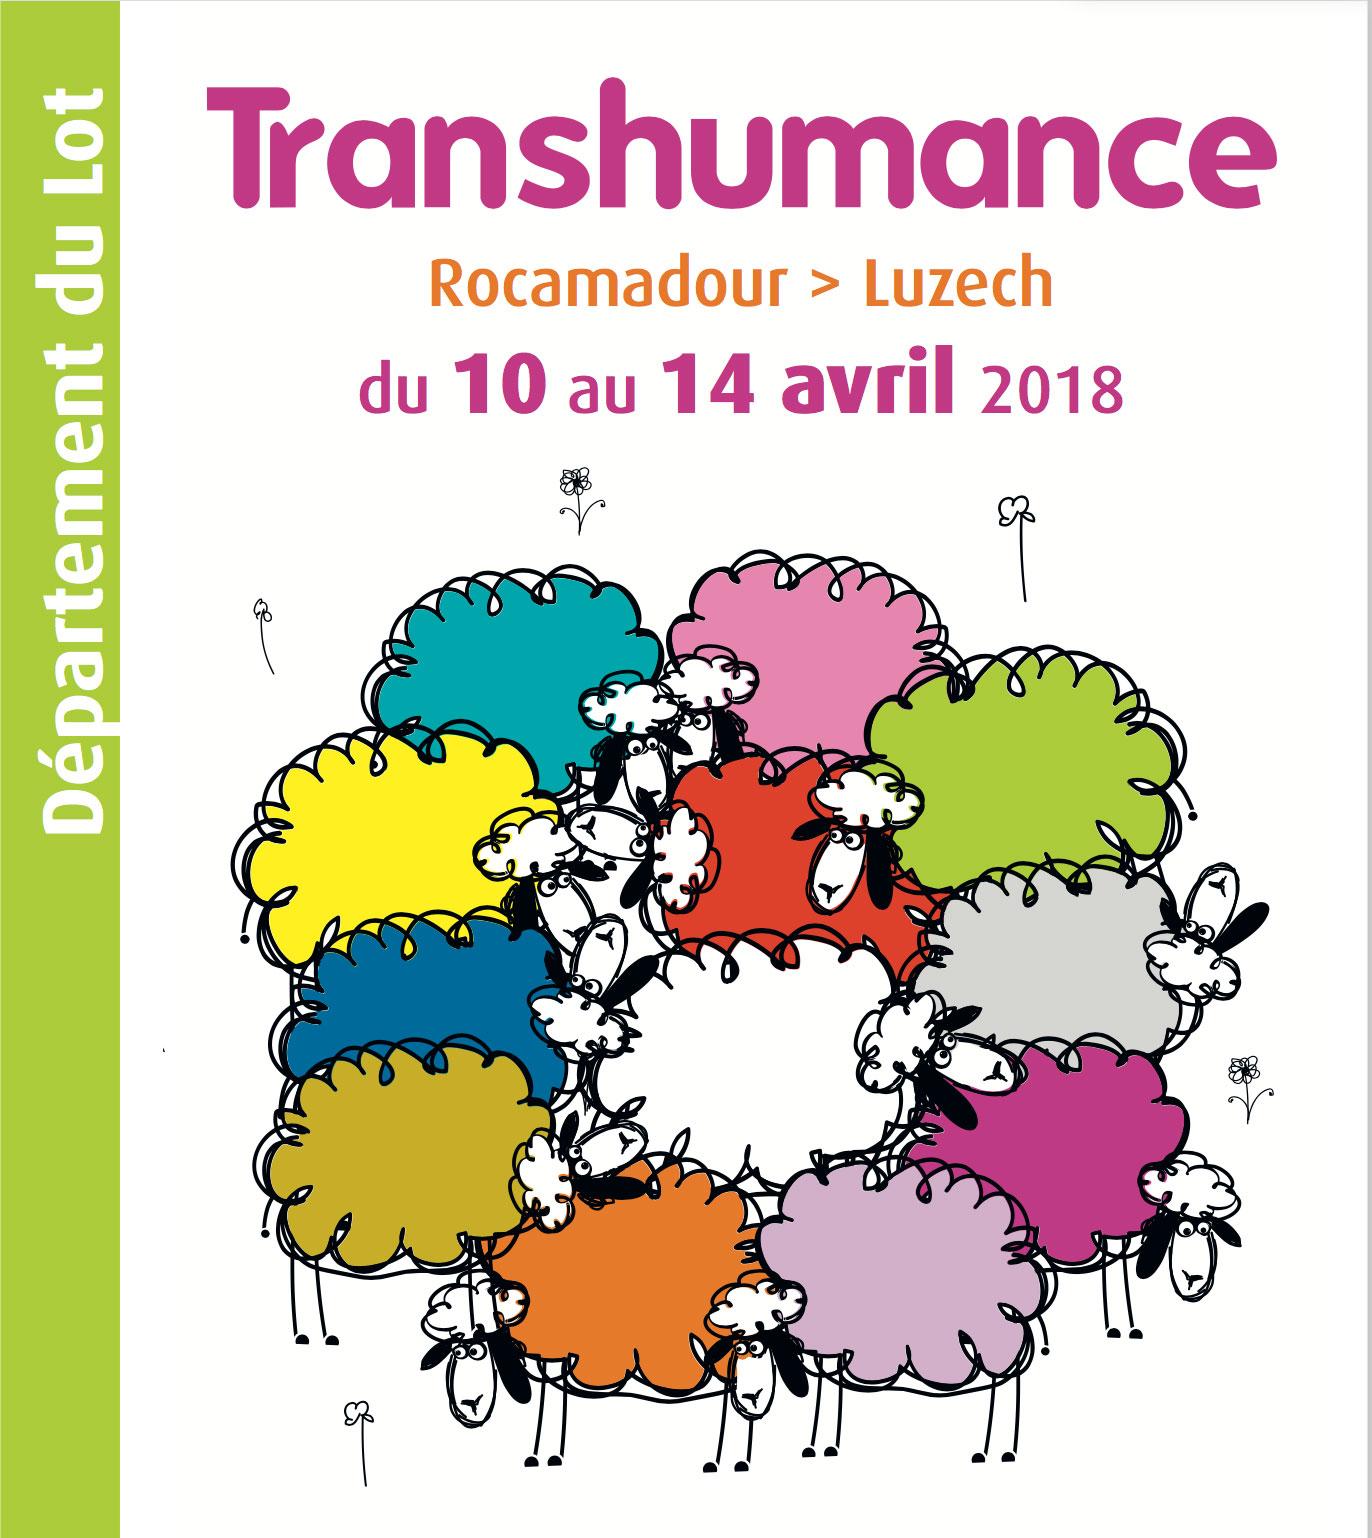 TRANSHUMANCE 2018 - 10 au 14 AVRIL 2018